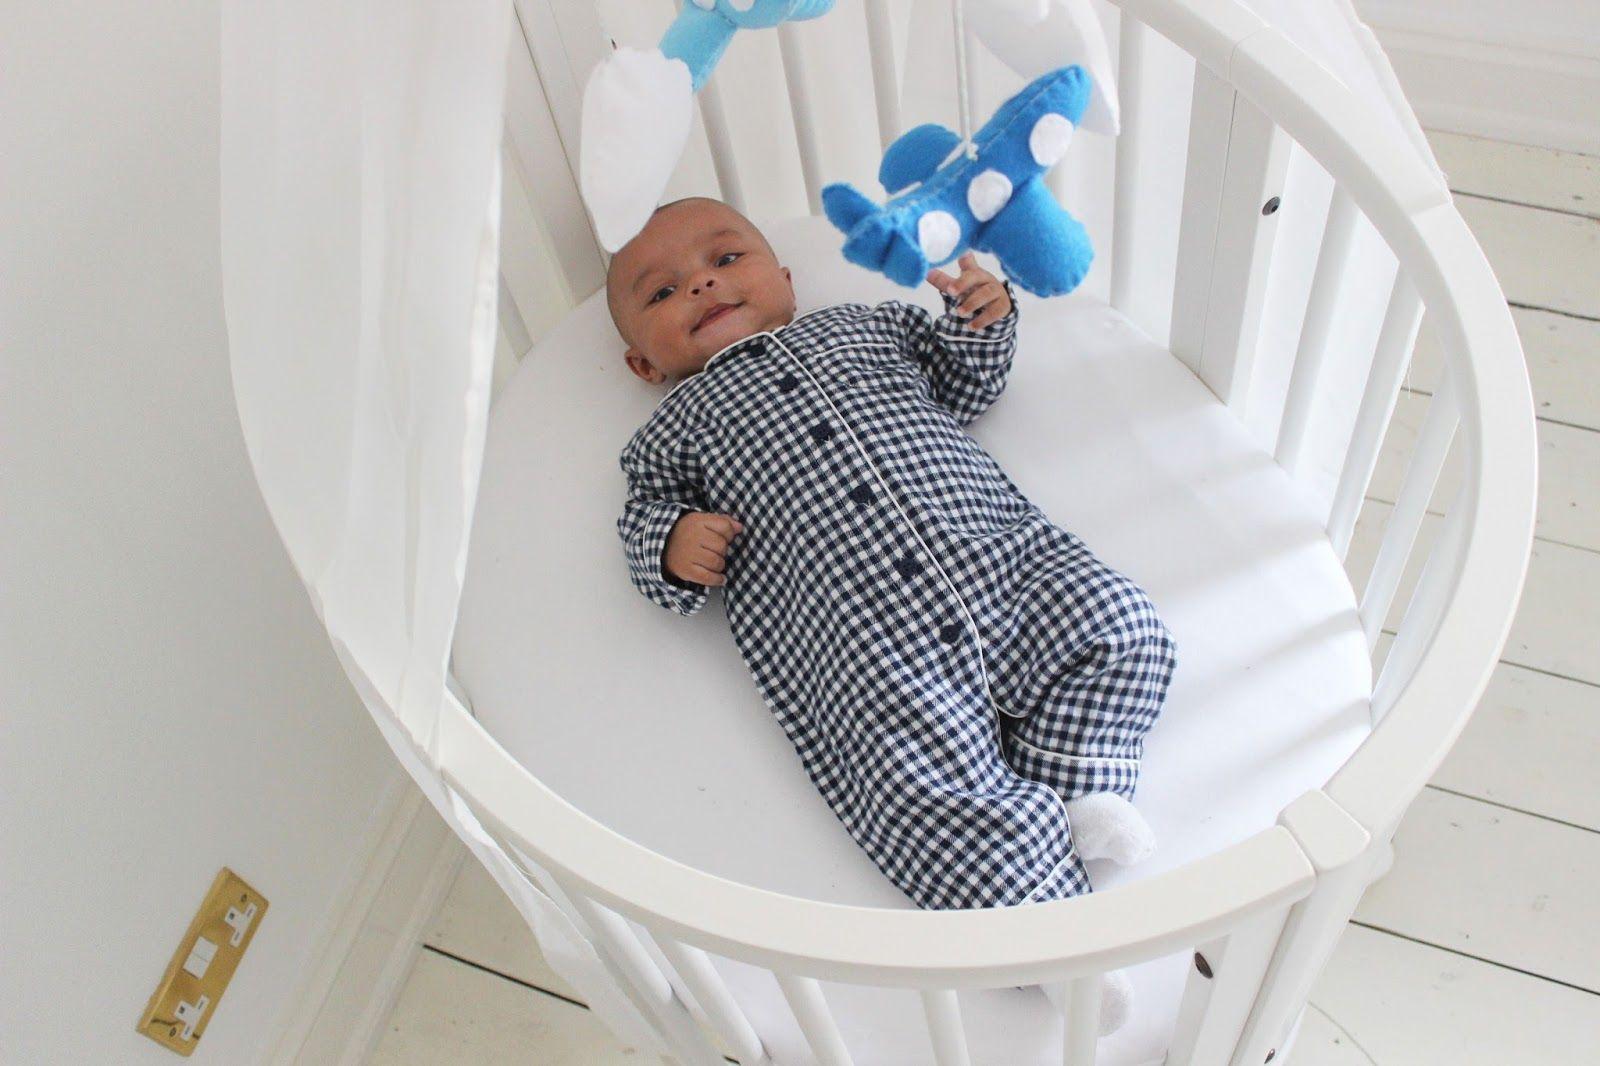 Baby bed extension uk - Harrison Loves Stokke Sleepi Mini Sleepi Extension Pack Belles Boutique Uk Beauty